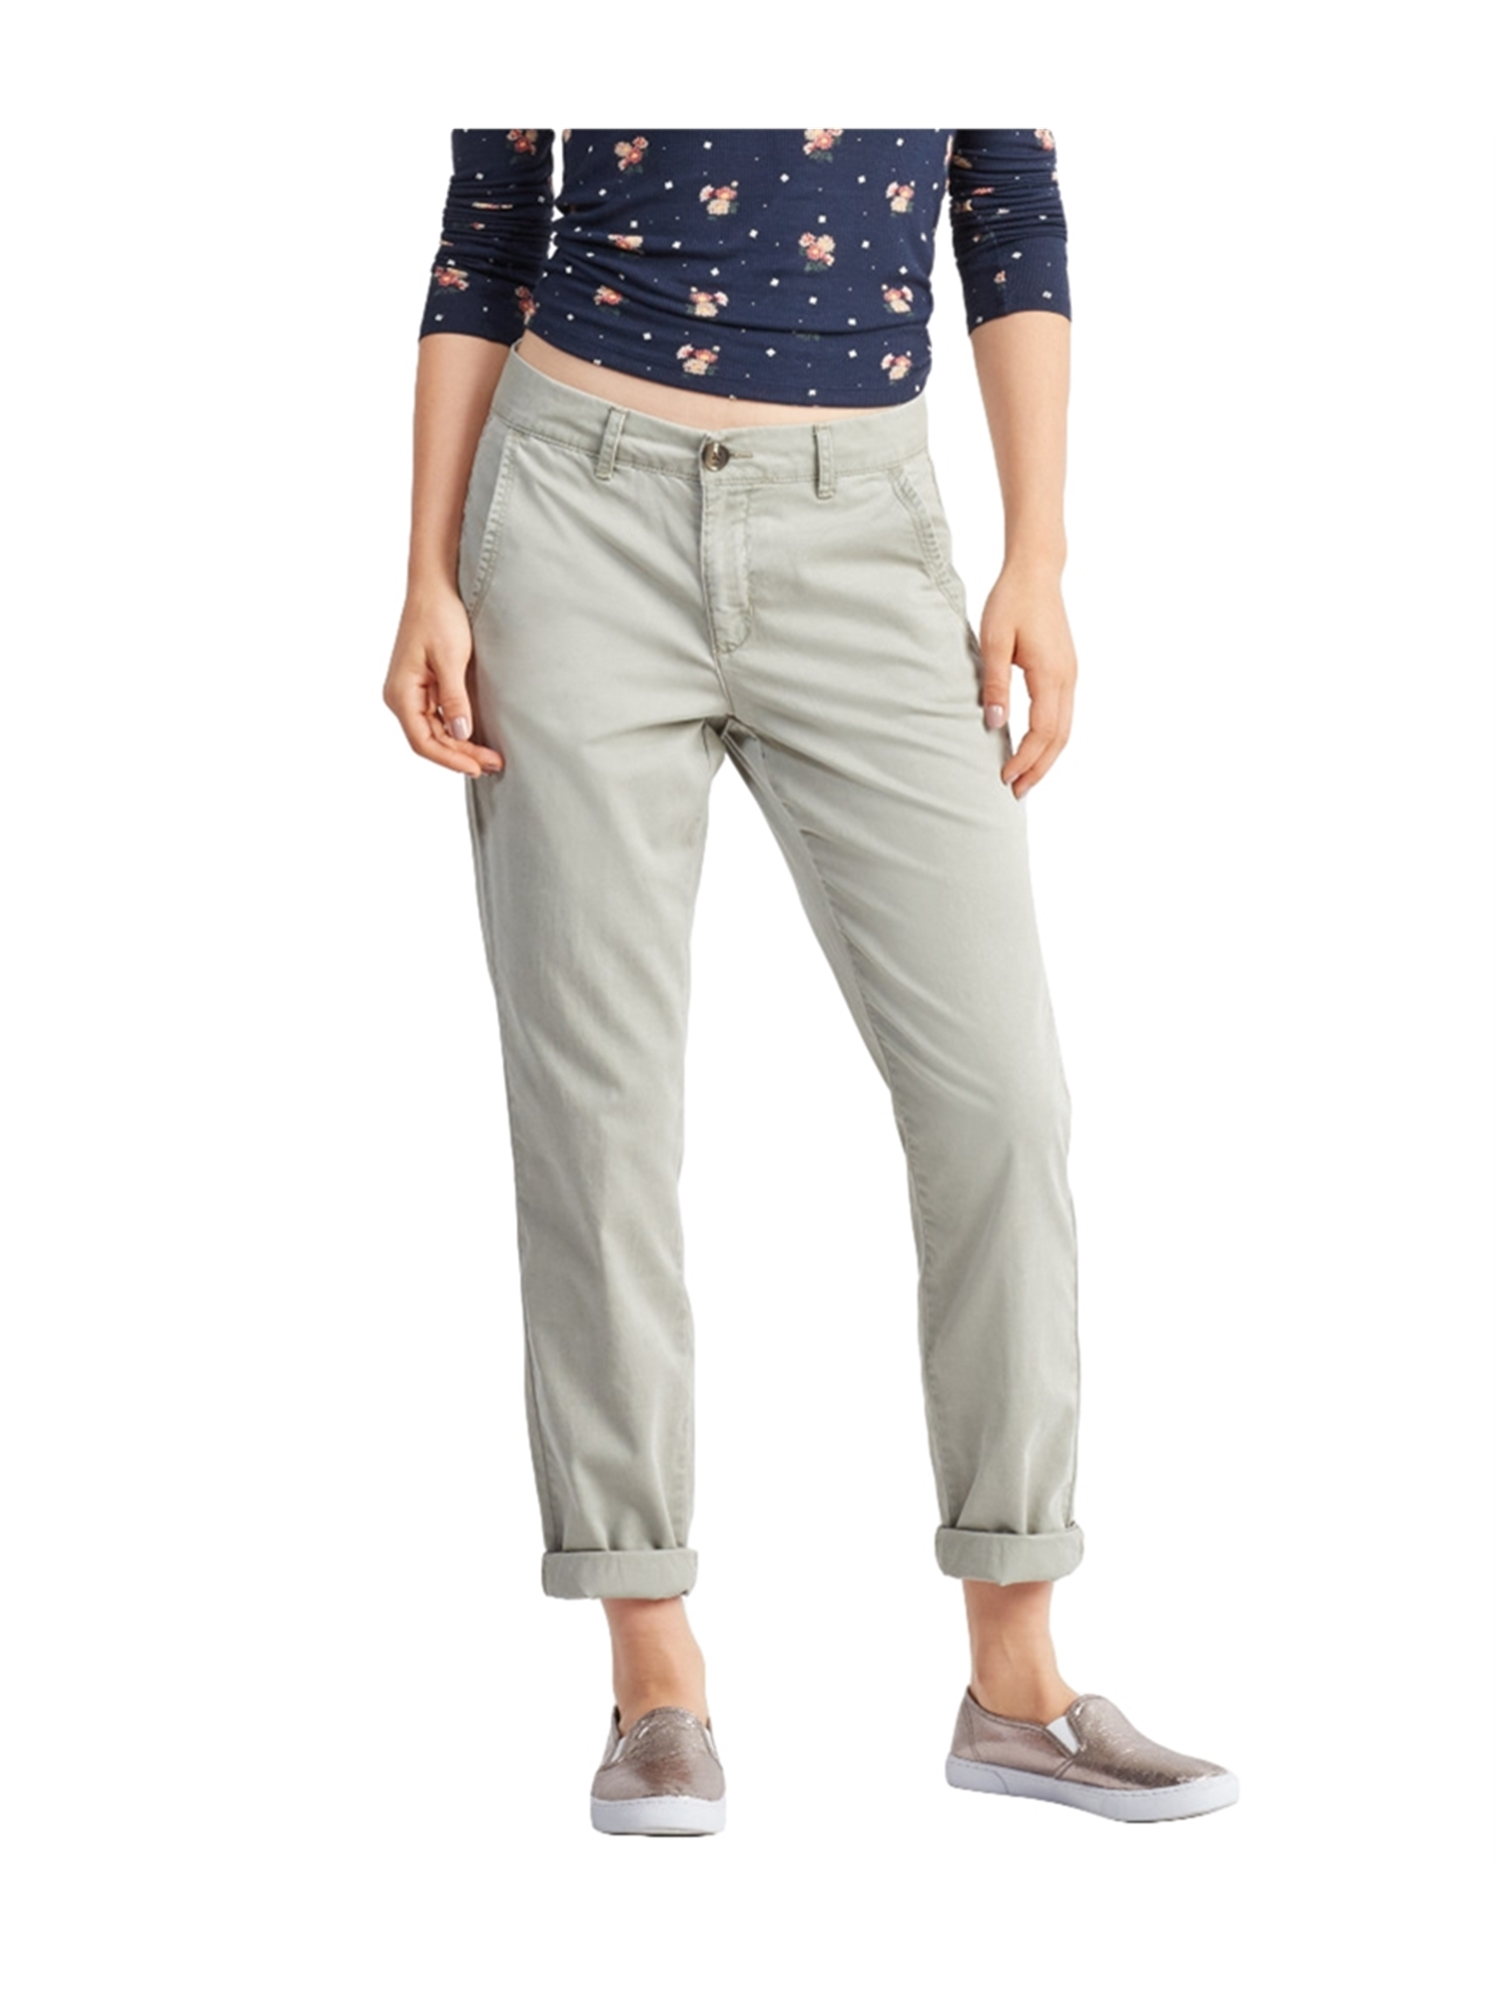 Aeropostale Juniors Chino Casual Trousers